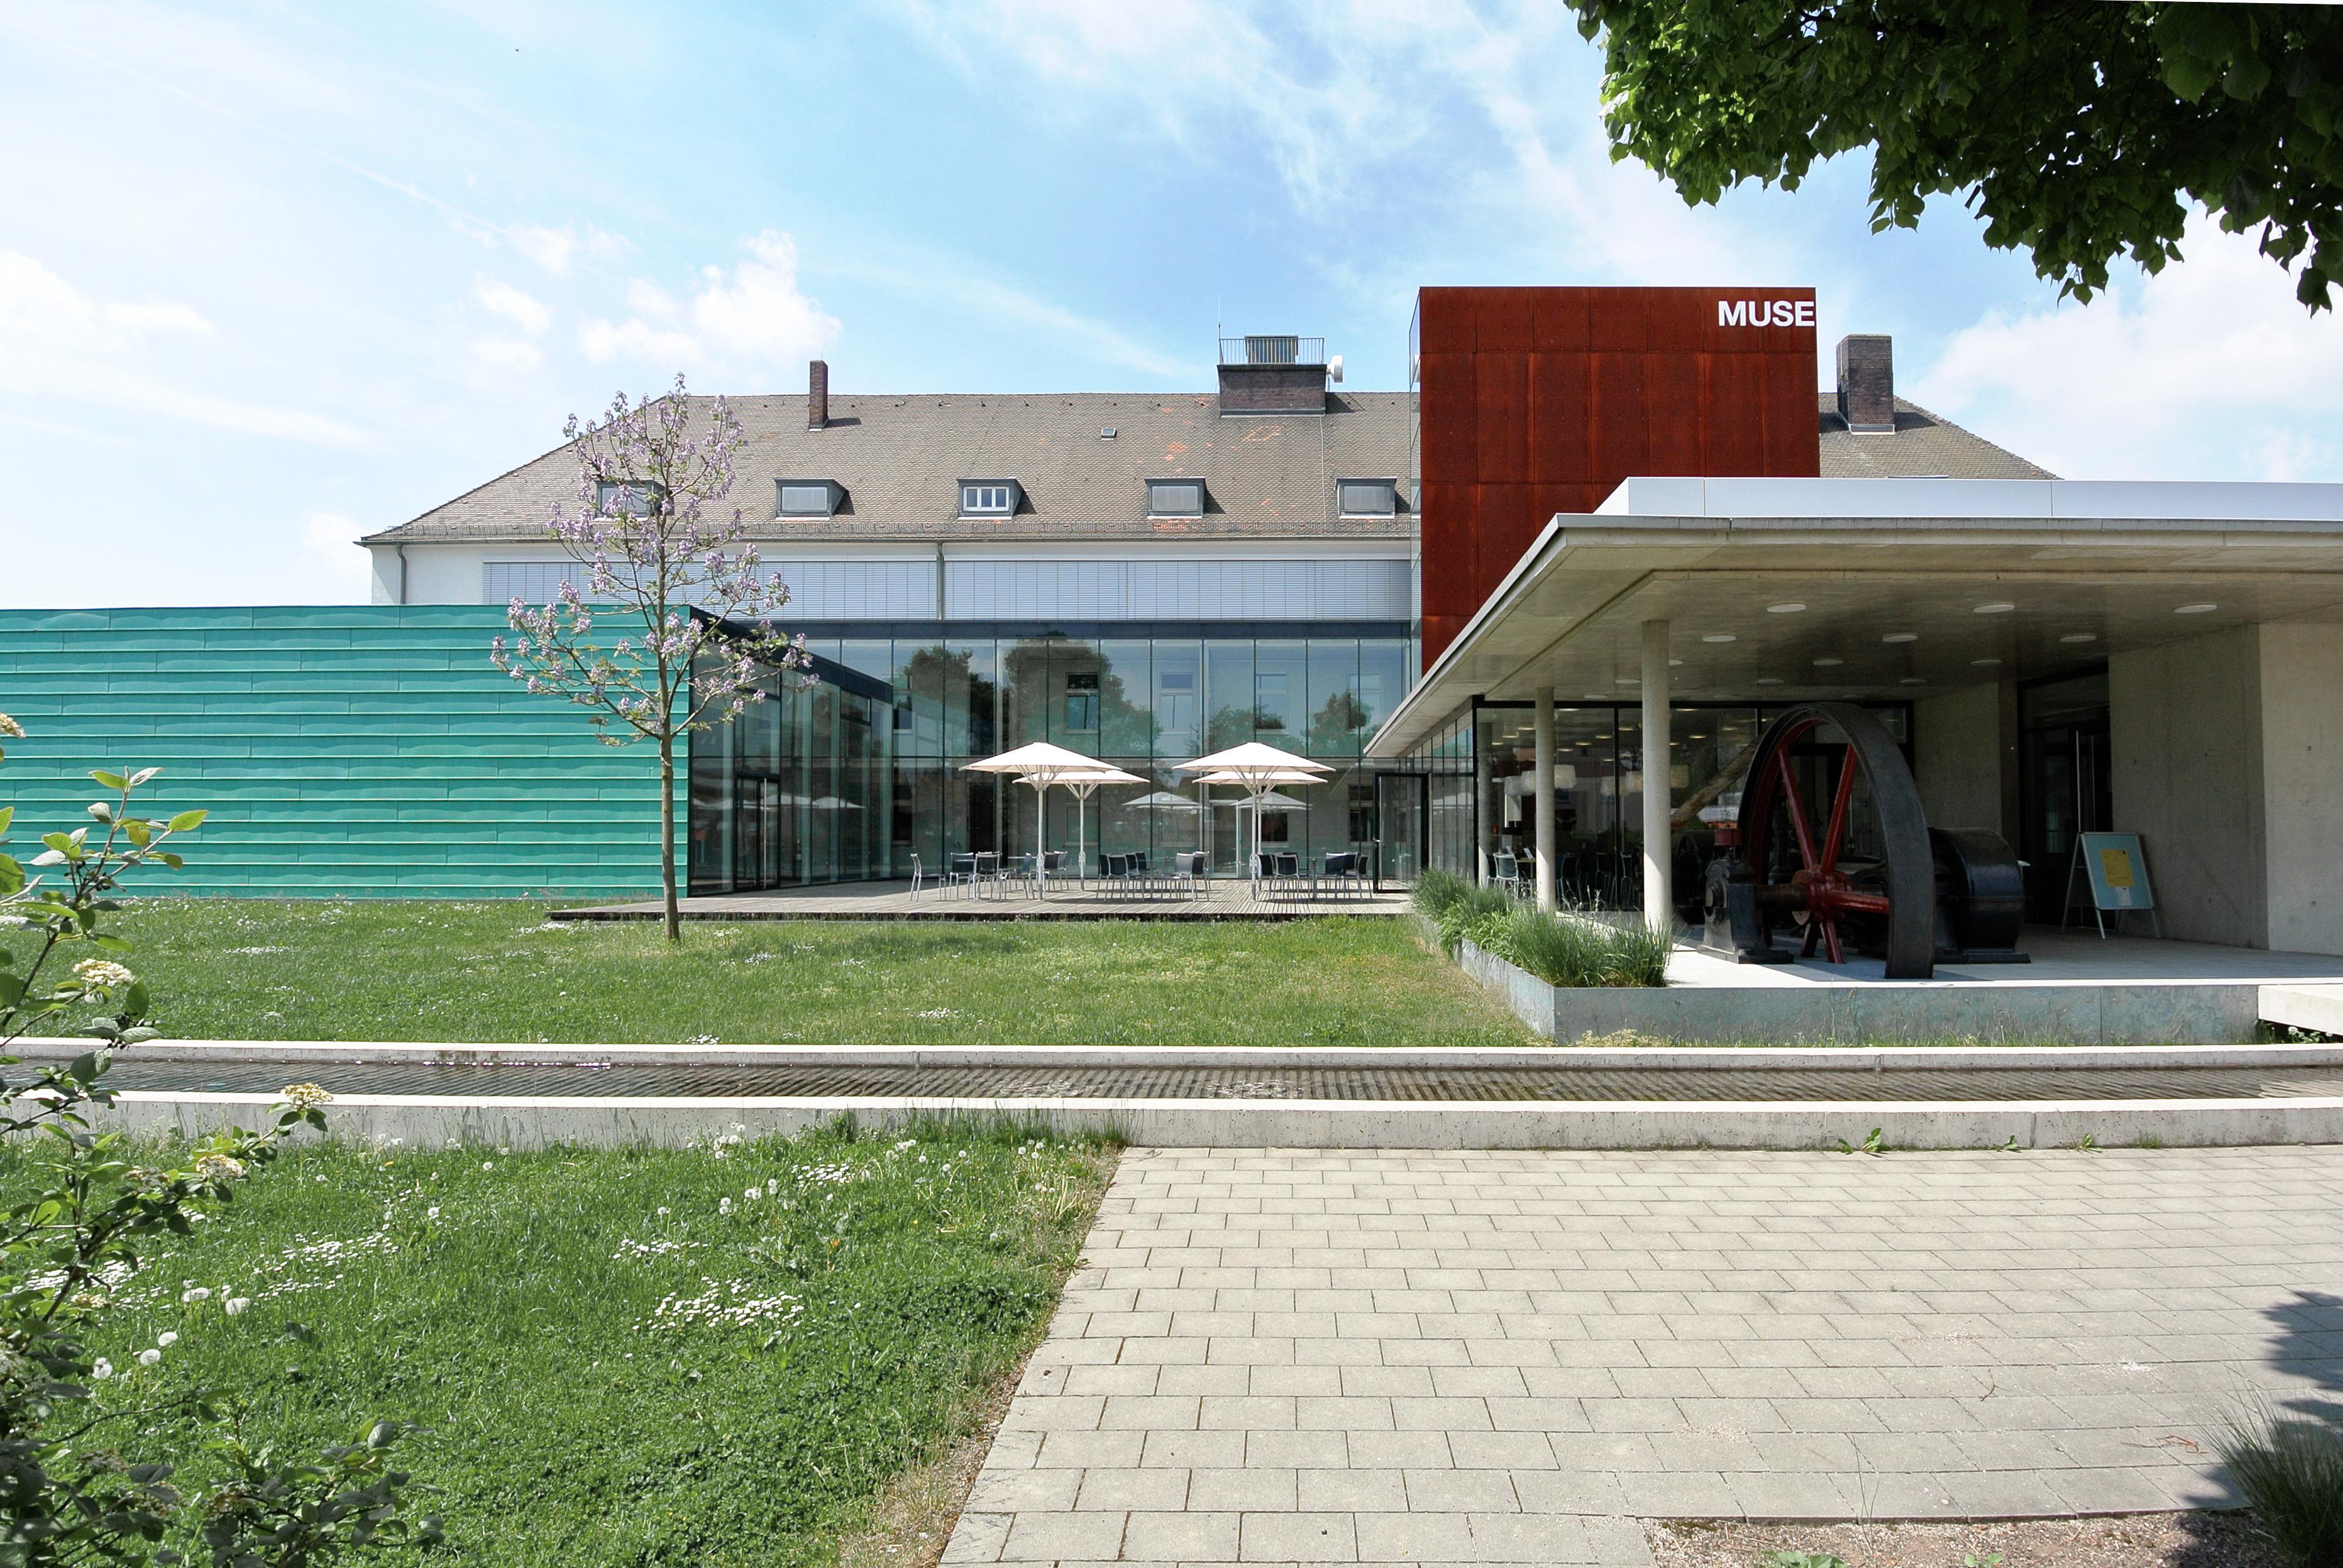 Stadtmuseum_Schwabach-Ost.jpg